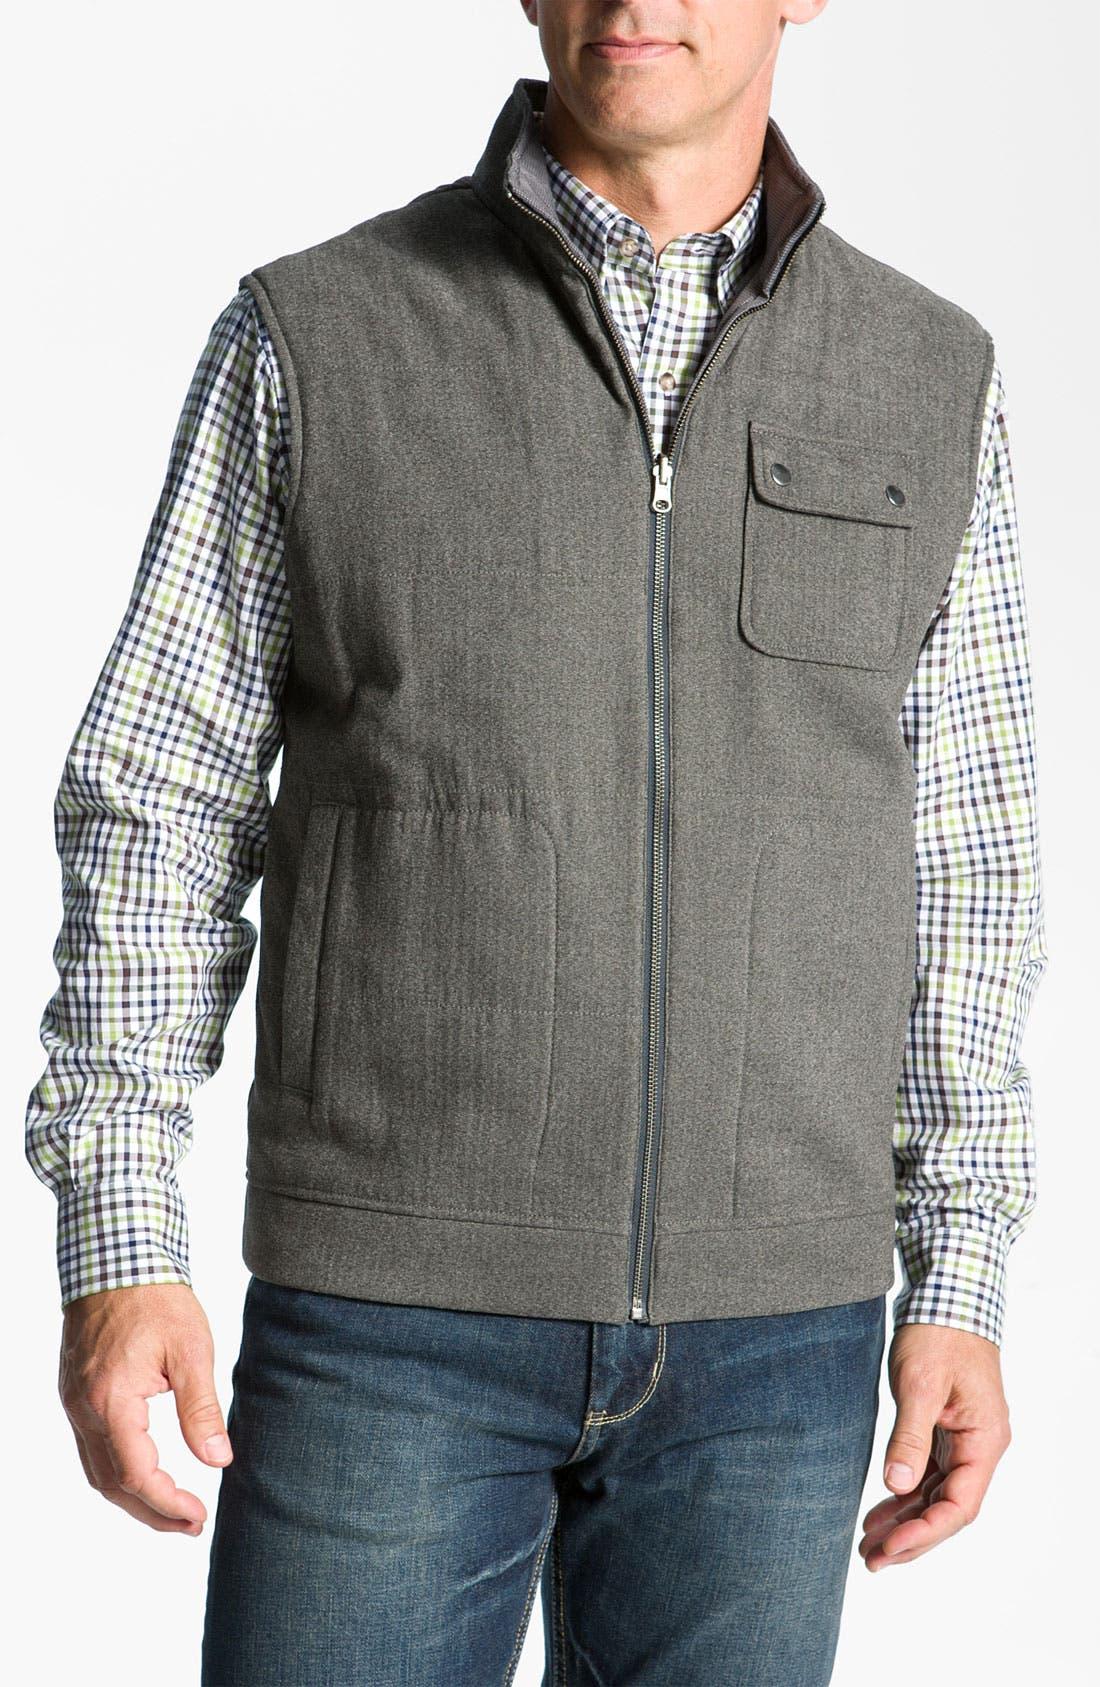 Alternate Image 1 Selected - Cutter & Buck 'Mount Baker' Reversible Vest (Online Exclusive)